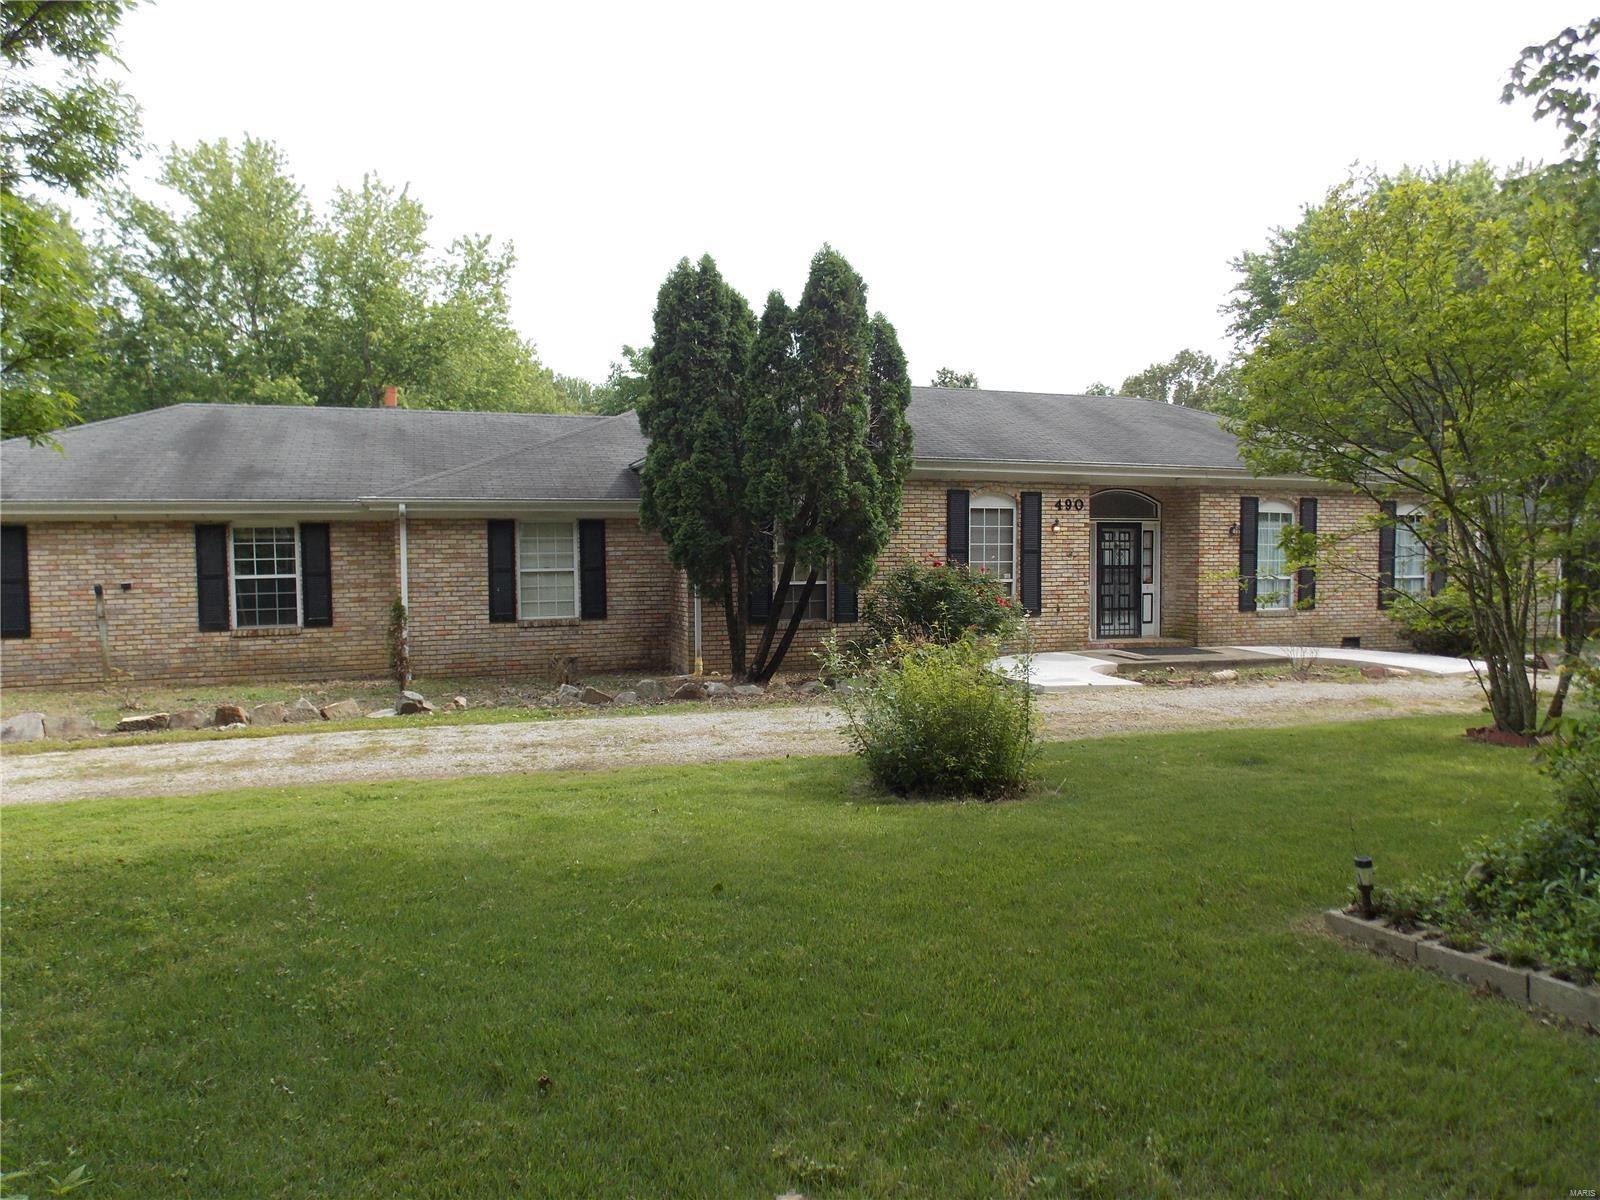 490 County Road 4706, Poplar Bluff, MO 63901 - MLS#: 21037625